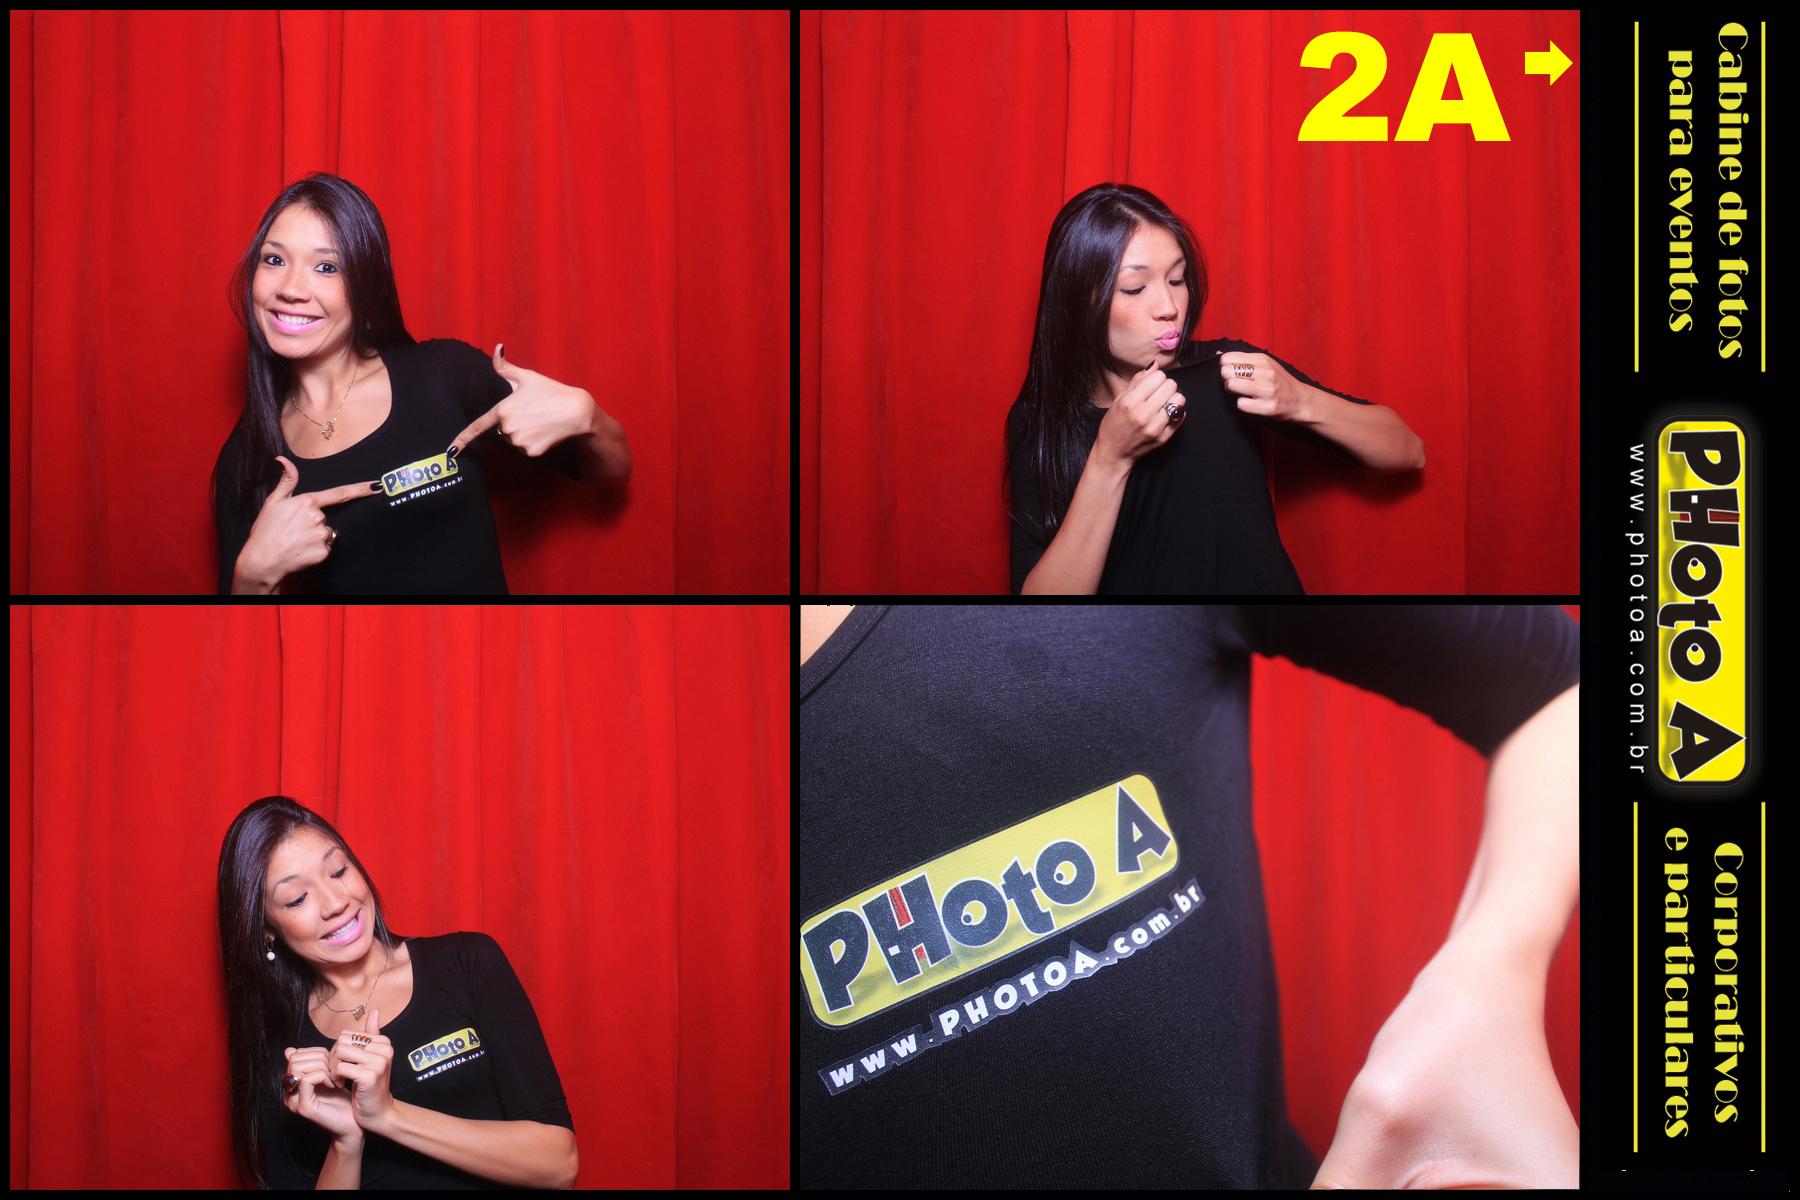 Exemplos Fotos - Photo A (exemplo 2)  - cabine de fotos - fotocabine - fotos cabine - photo booth - maquina de fotos